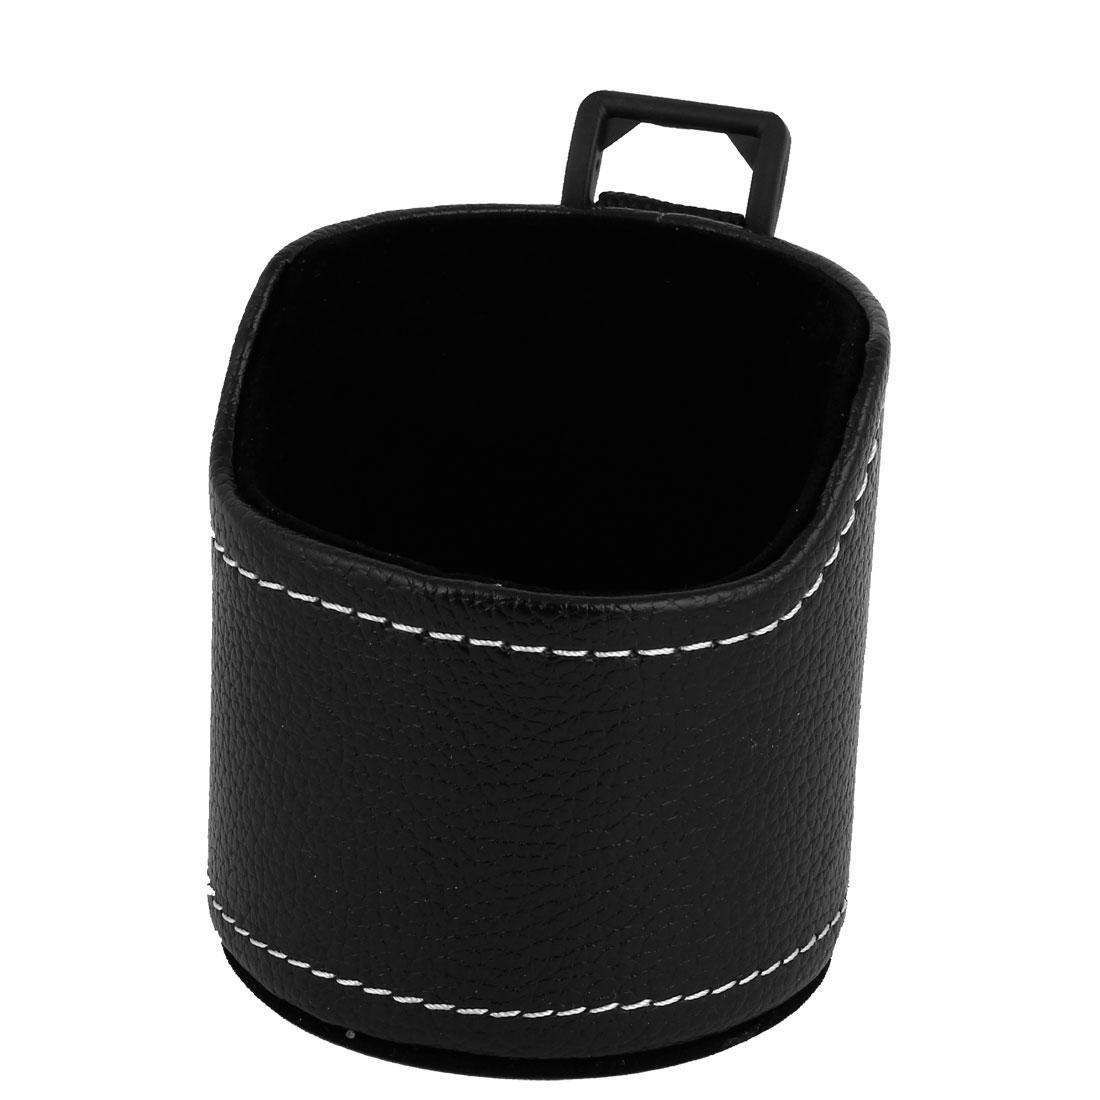 Black Faux Leather Auto Car Sundry Phone Organizer Case Storage